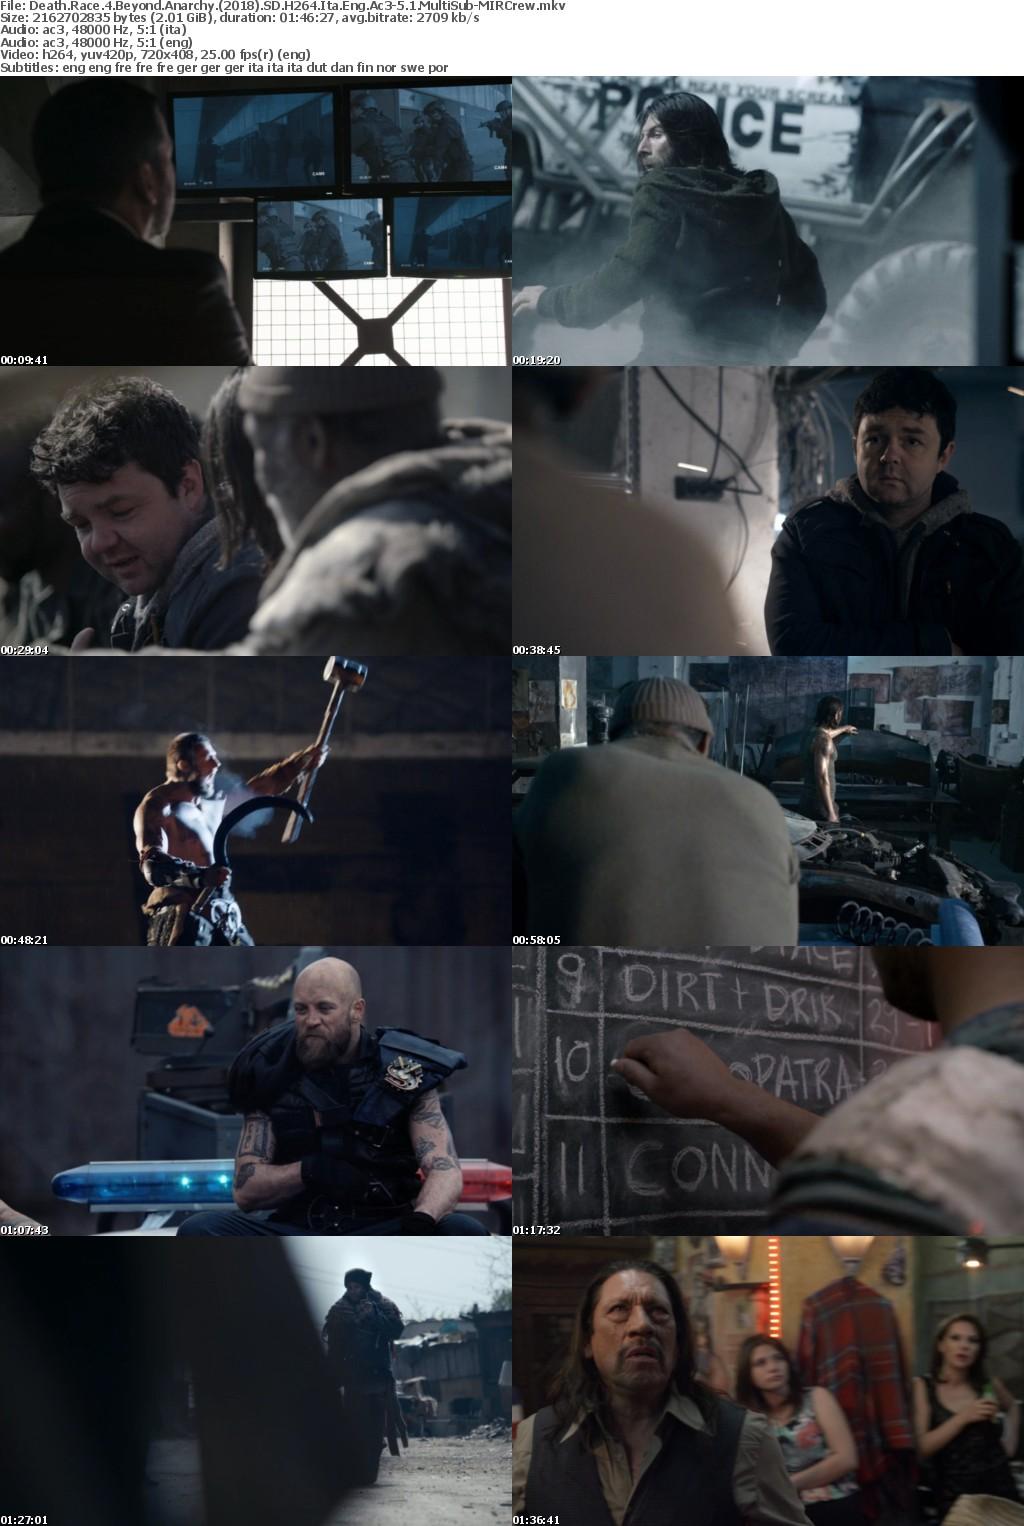 Death Race 4: Beyond Anarchy (2018) SD H264 Ita Ac3-5 1 MultiSub-MIRCrew